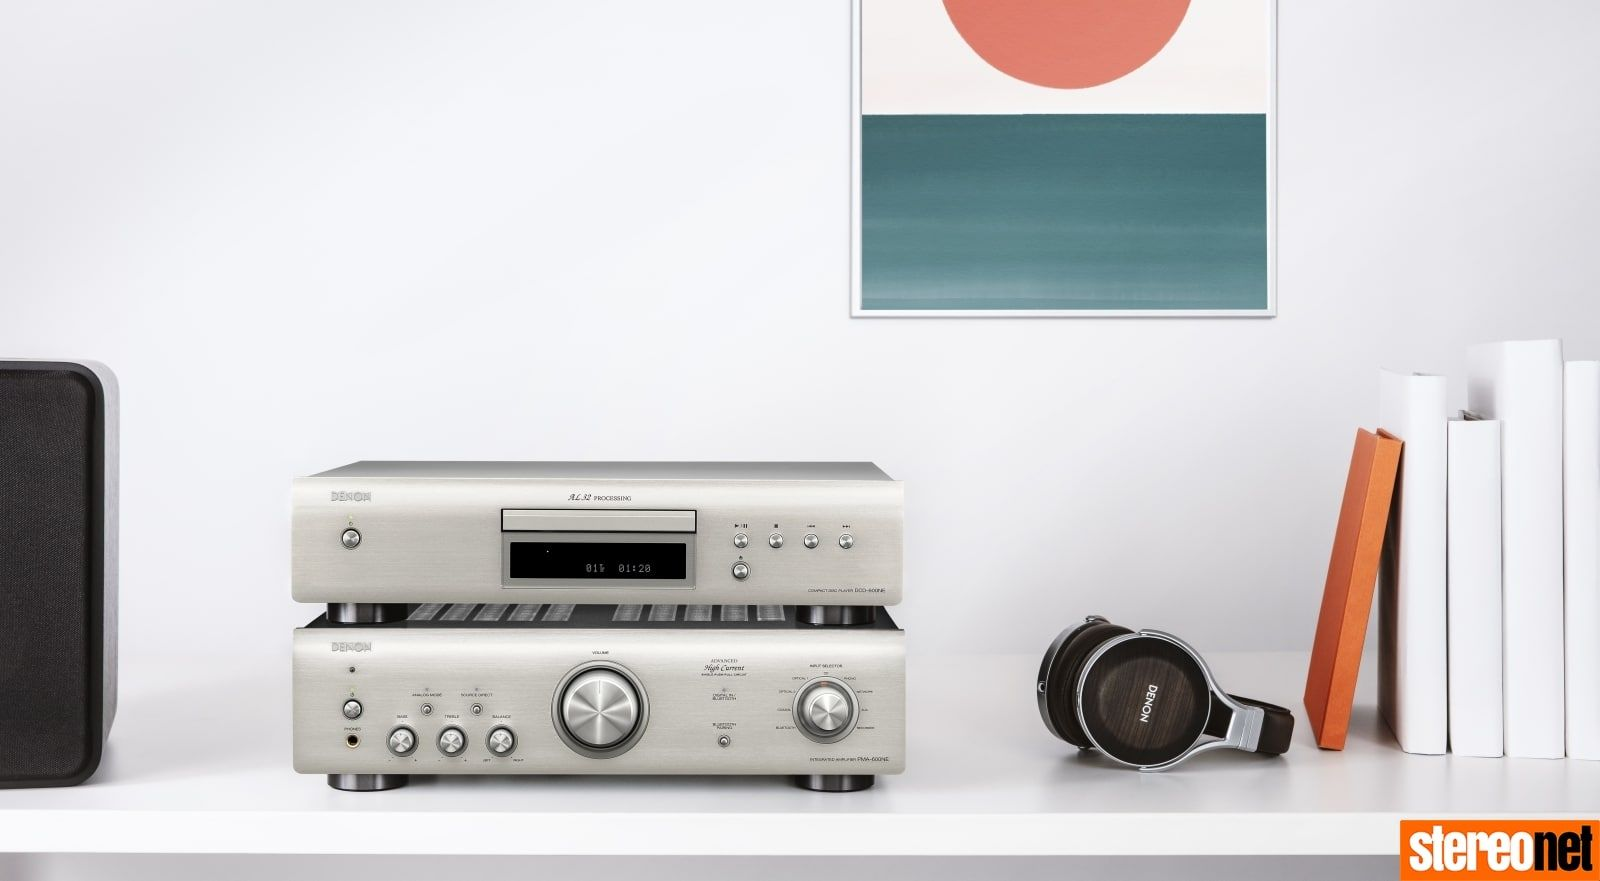 Amplificador Denon 5 compressor - DENON(デノン) PMA-600NE購入レビュー プリアンプエントリークラスの大本命【5万円以下】